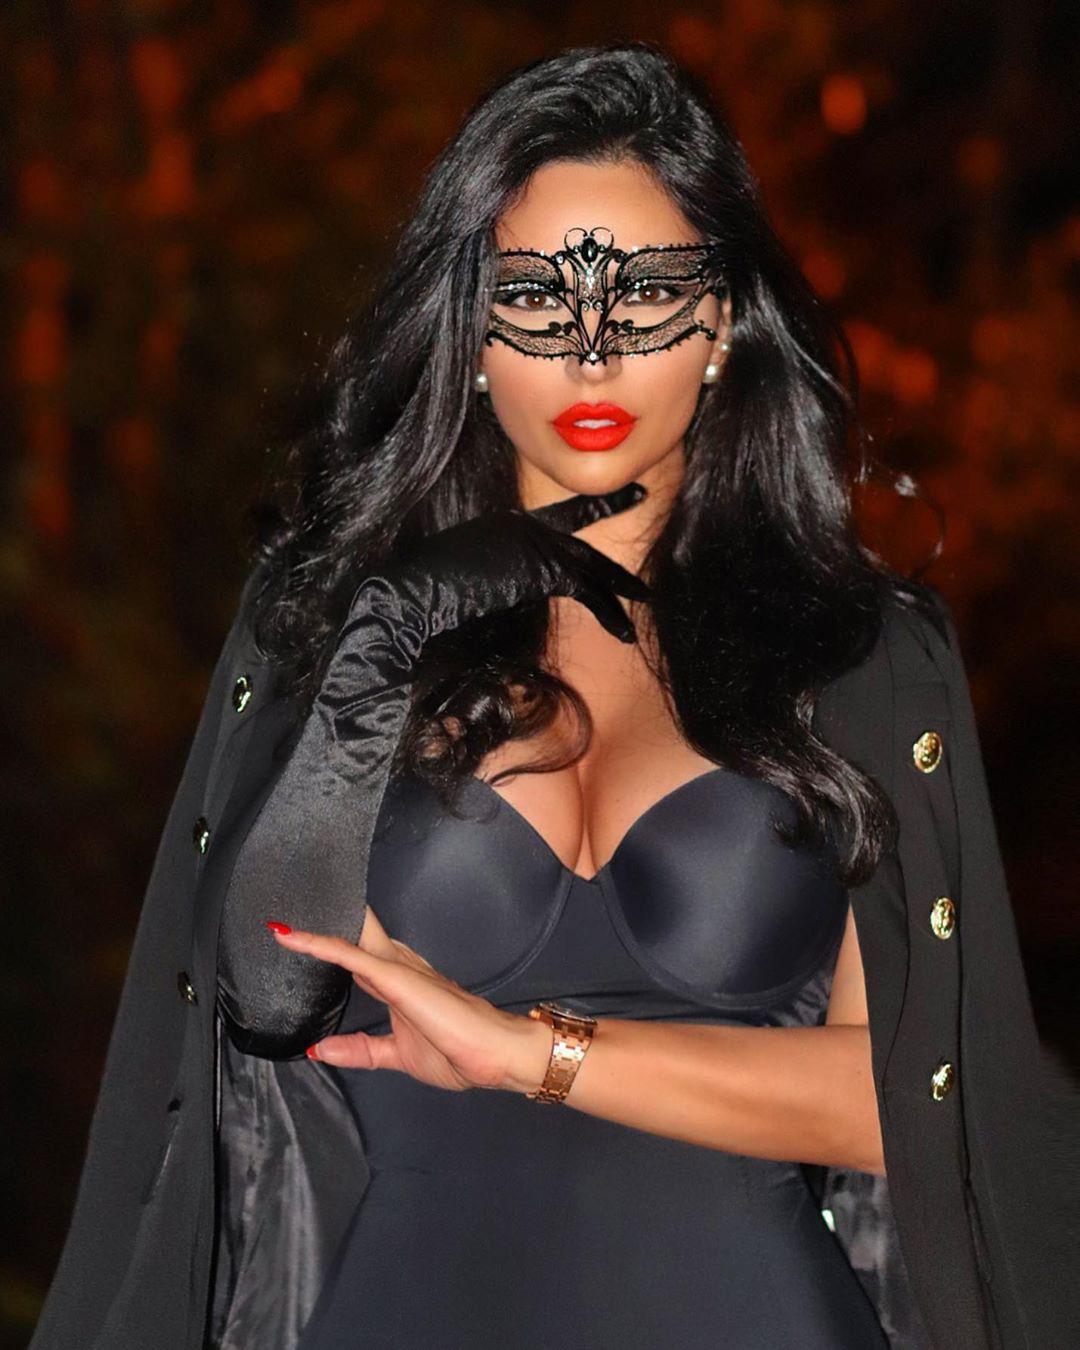 Shadi Y Cair Black Hair Color, Natural Lipstick, Long Hair Women